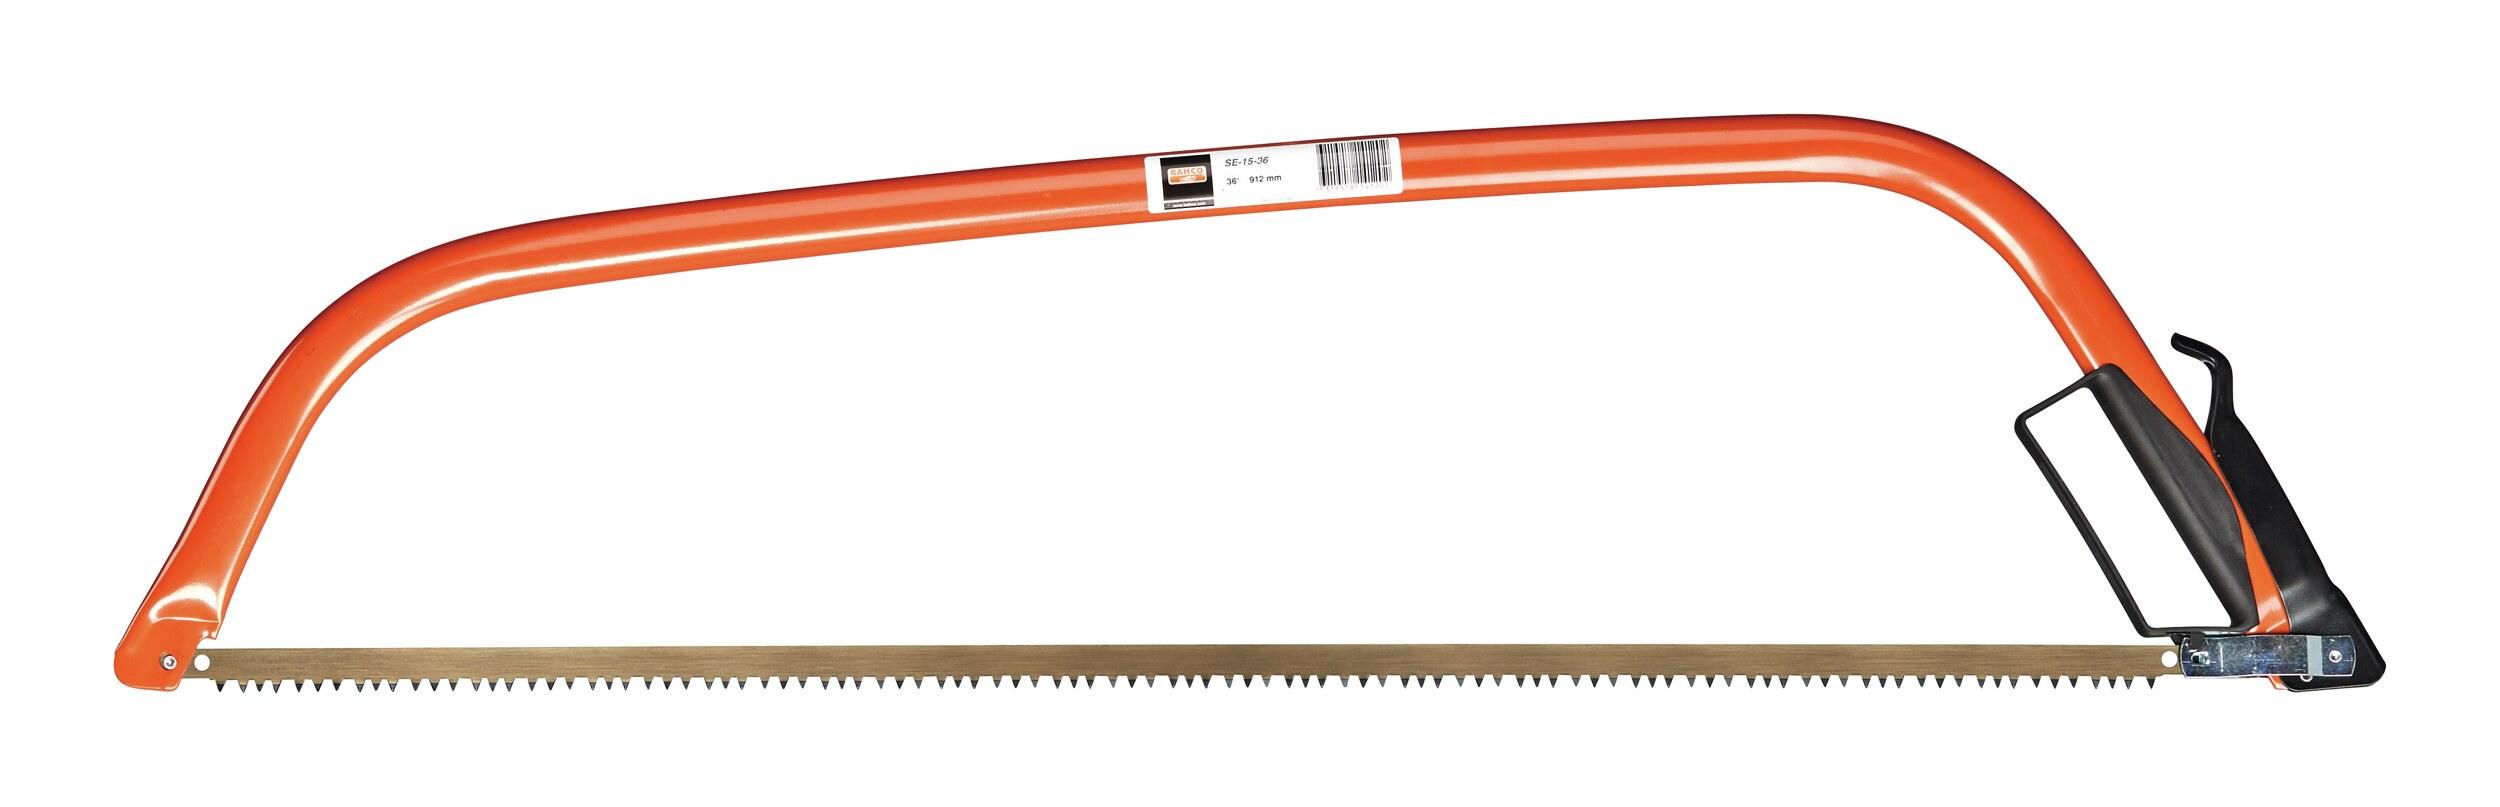 Bahco Bügelsäge 910mm - SE-15-36